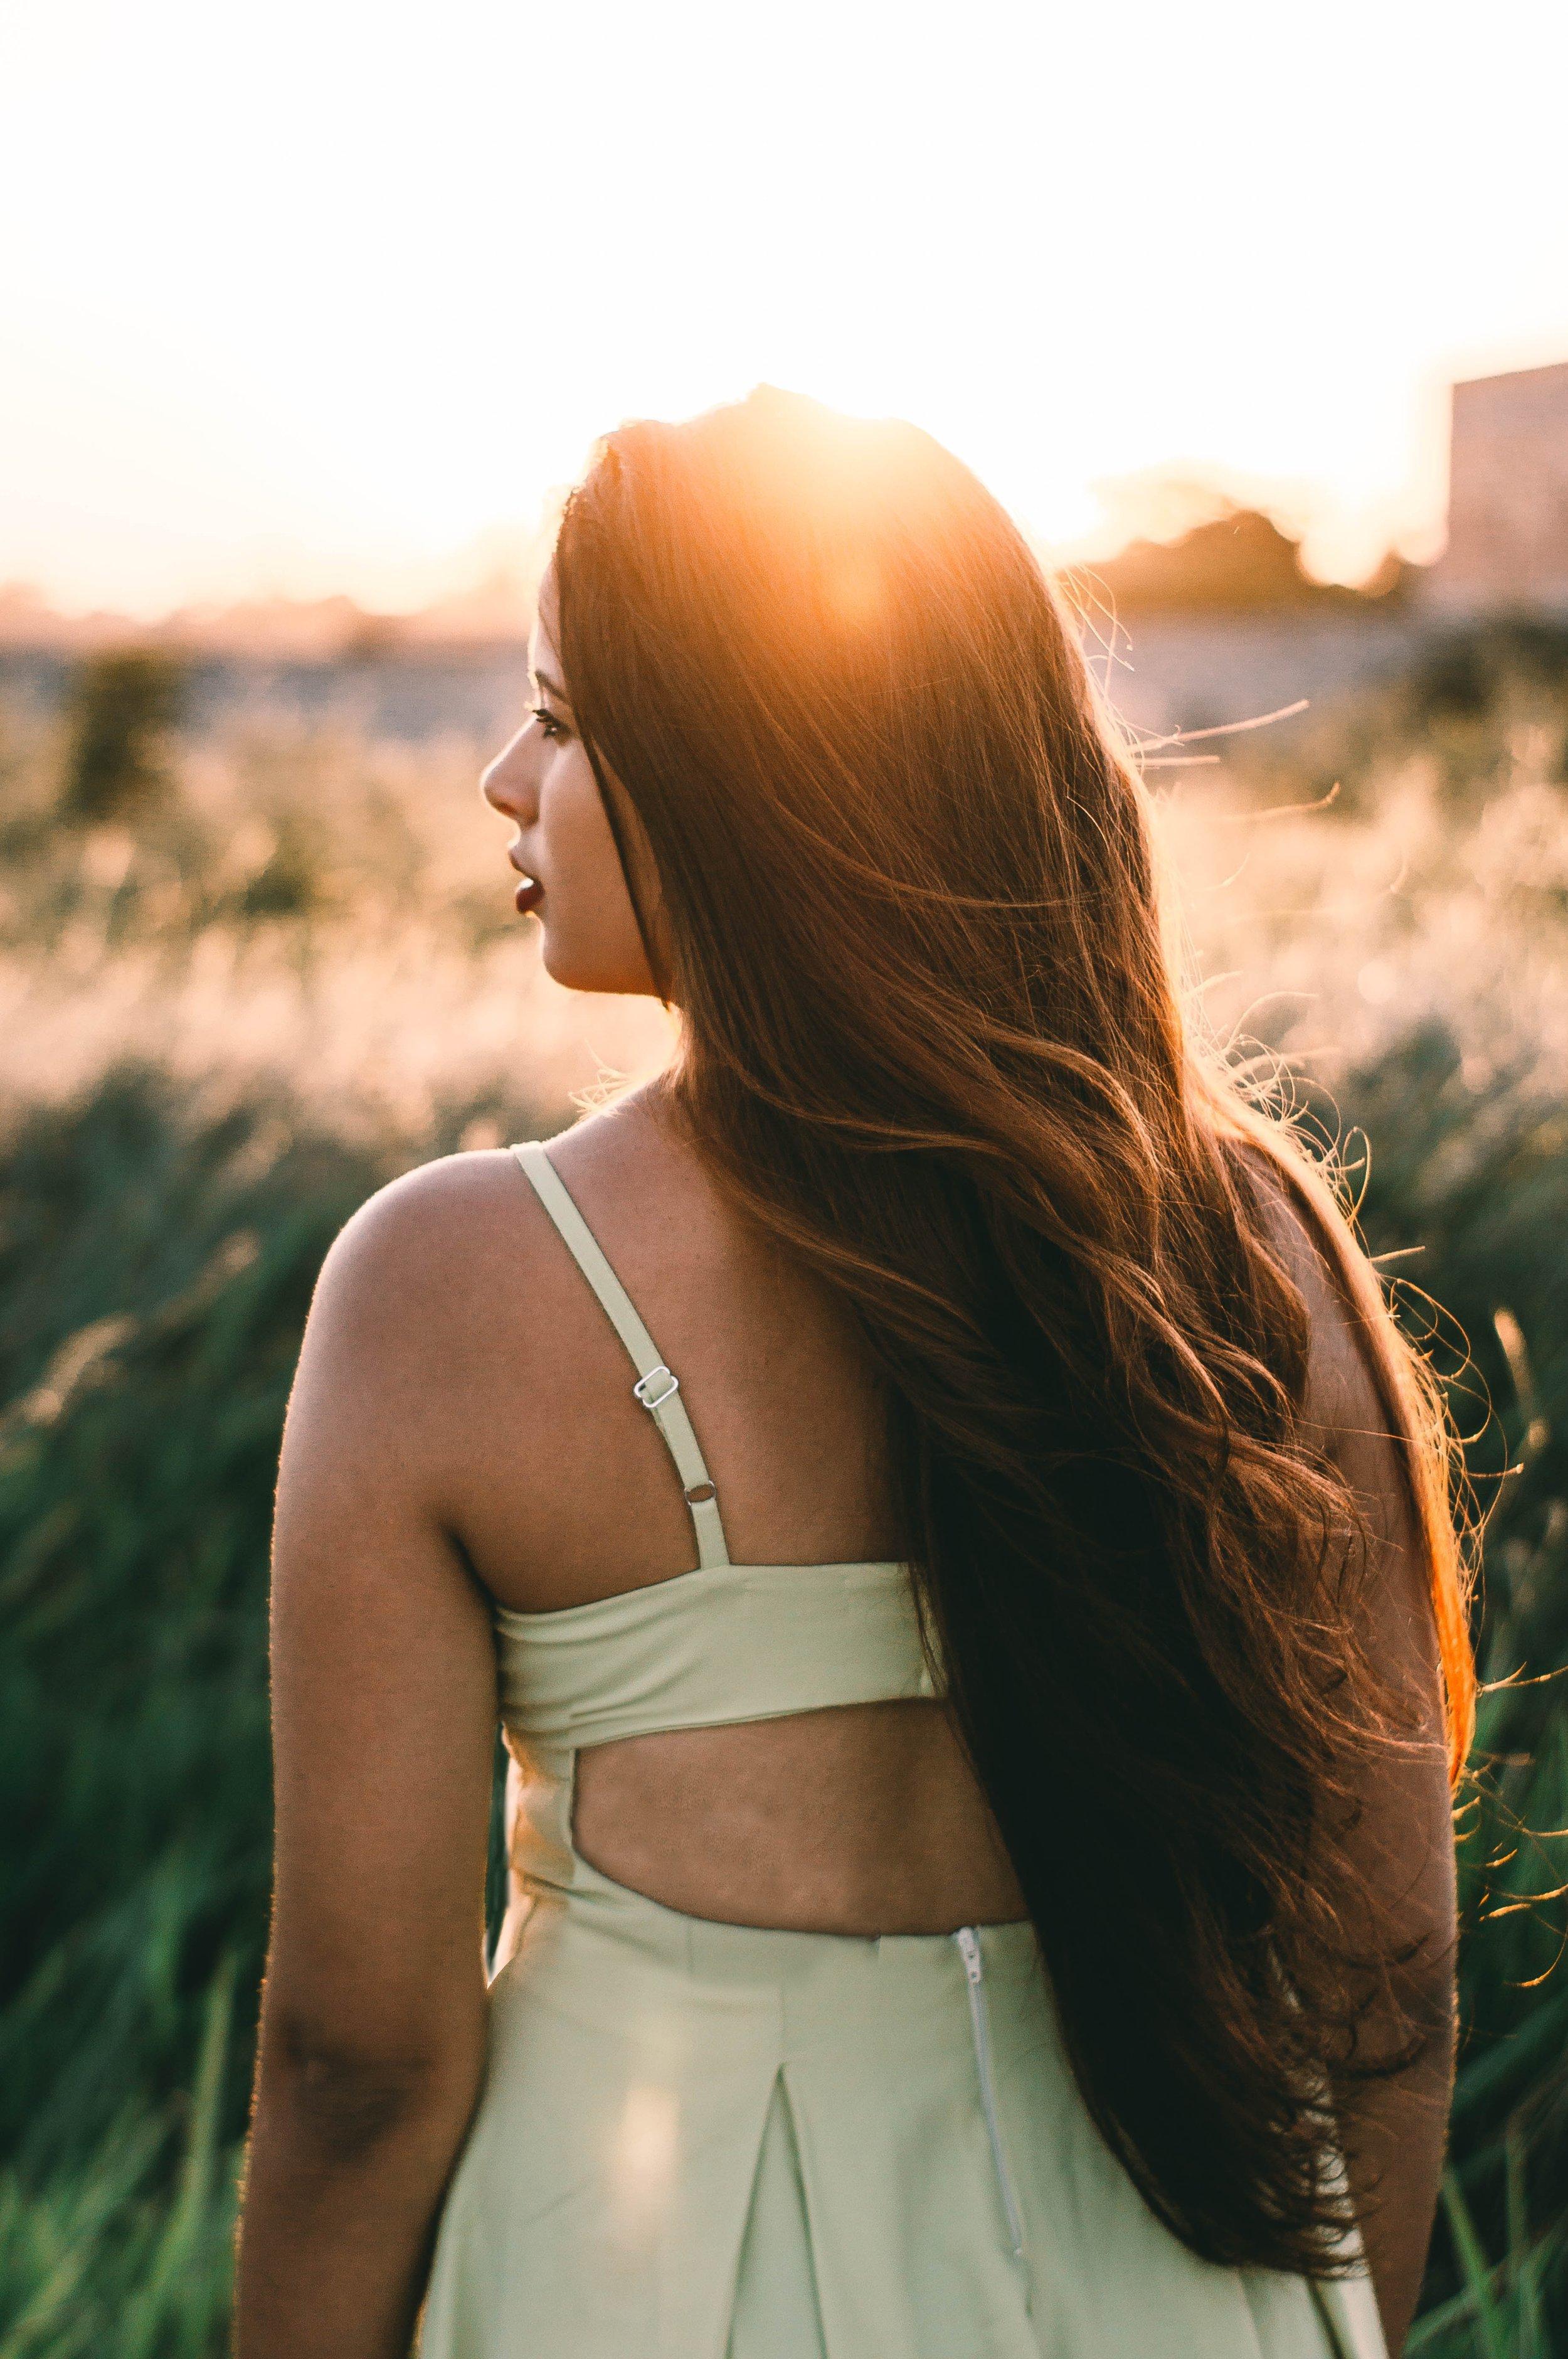 hispanic woman sunset.jpg